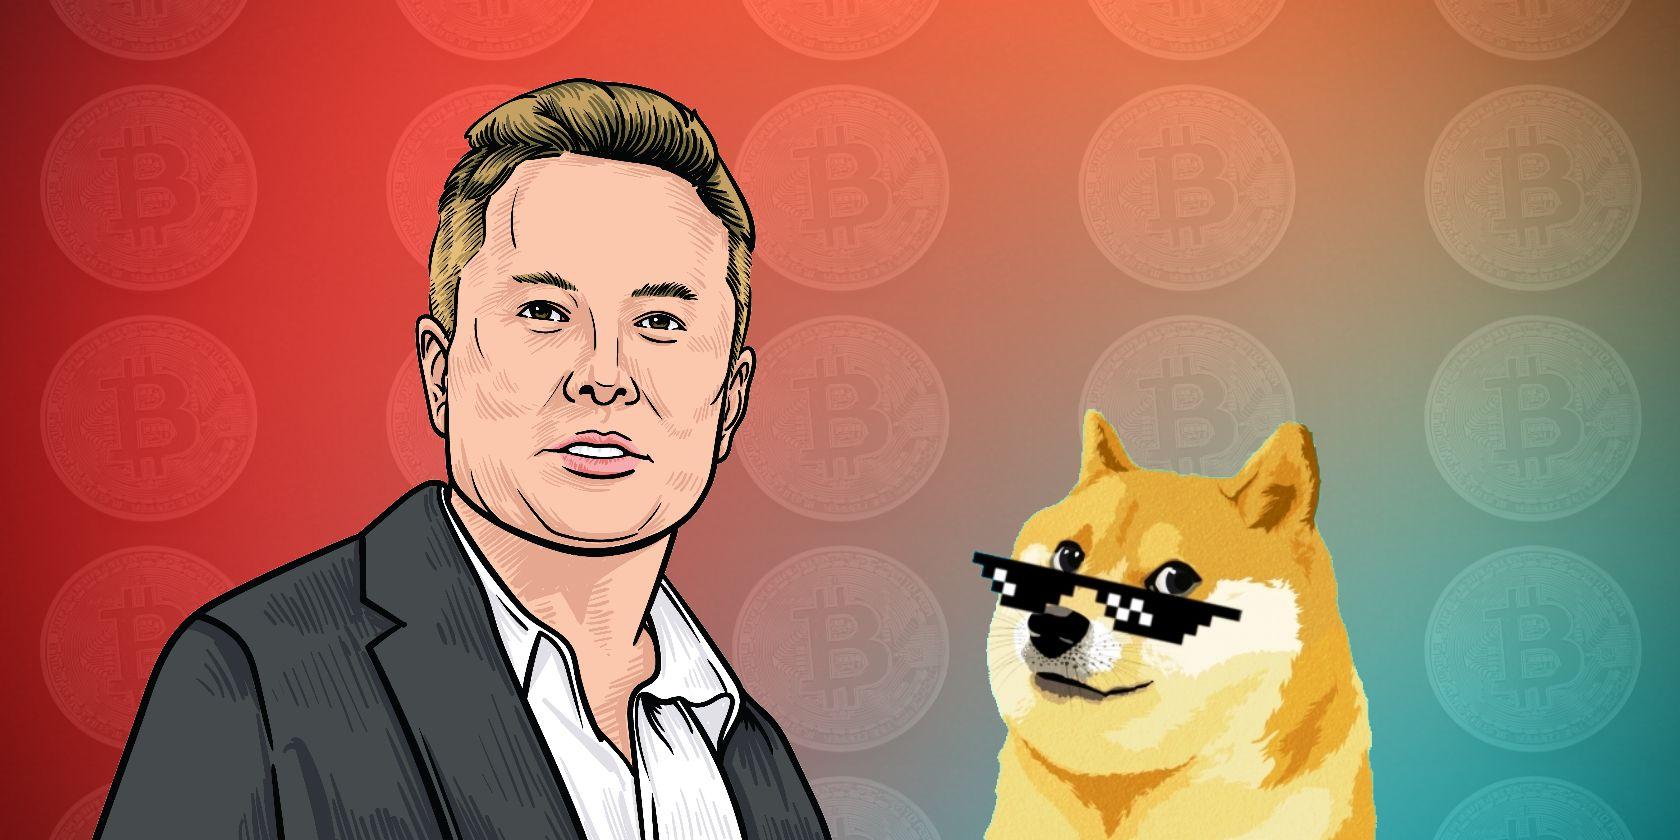 Did Elon Musk Really Cause the Bitcoin Price Crash?